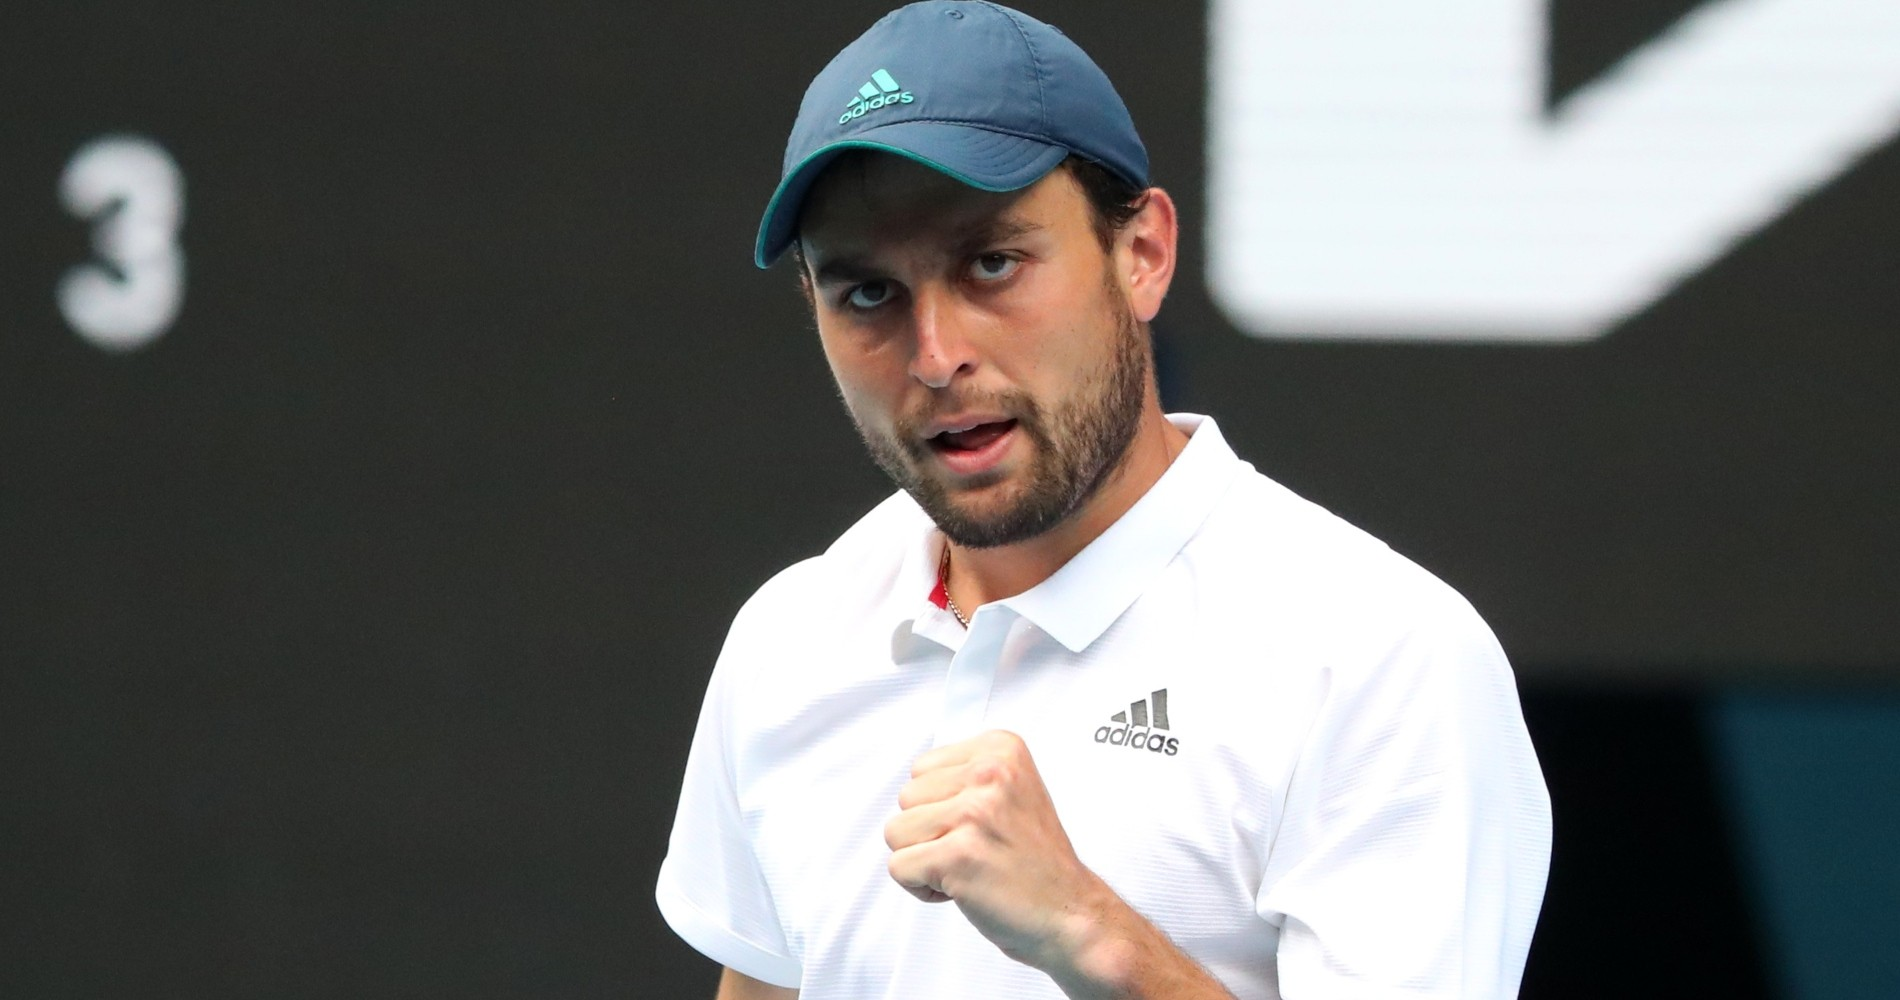 Aslan Karatsev at the 2021 Australian Open